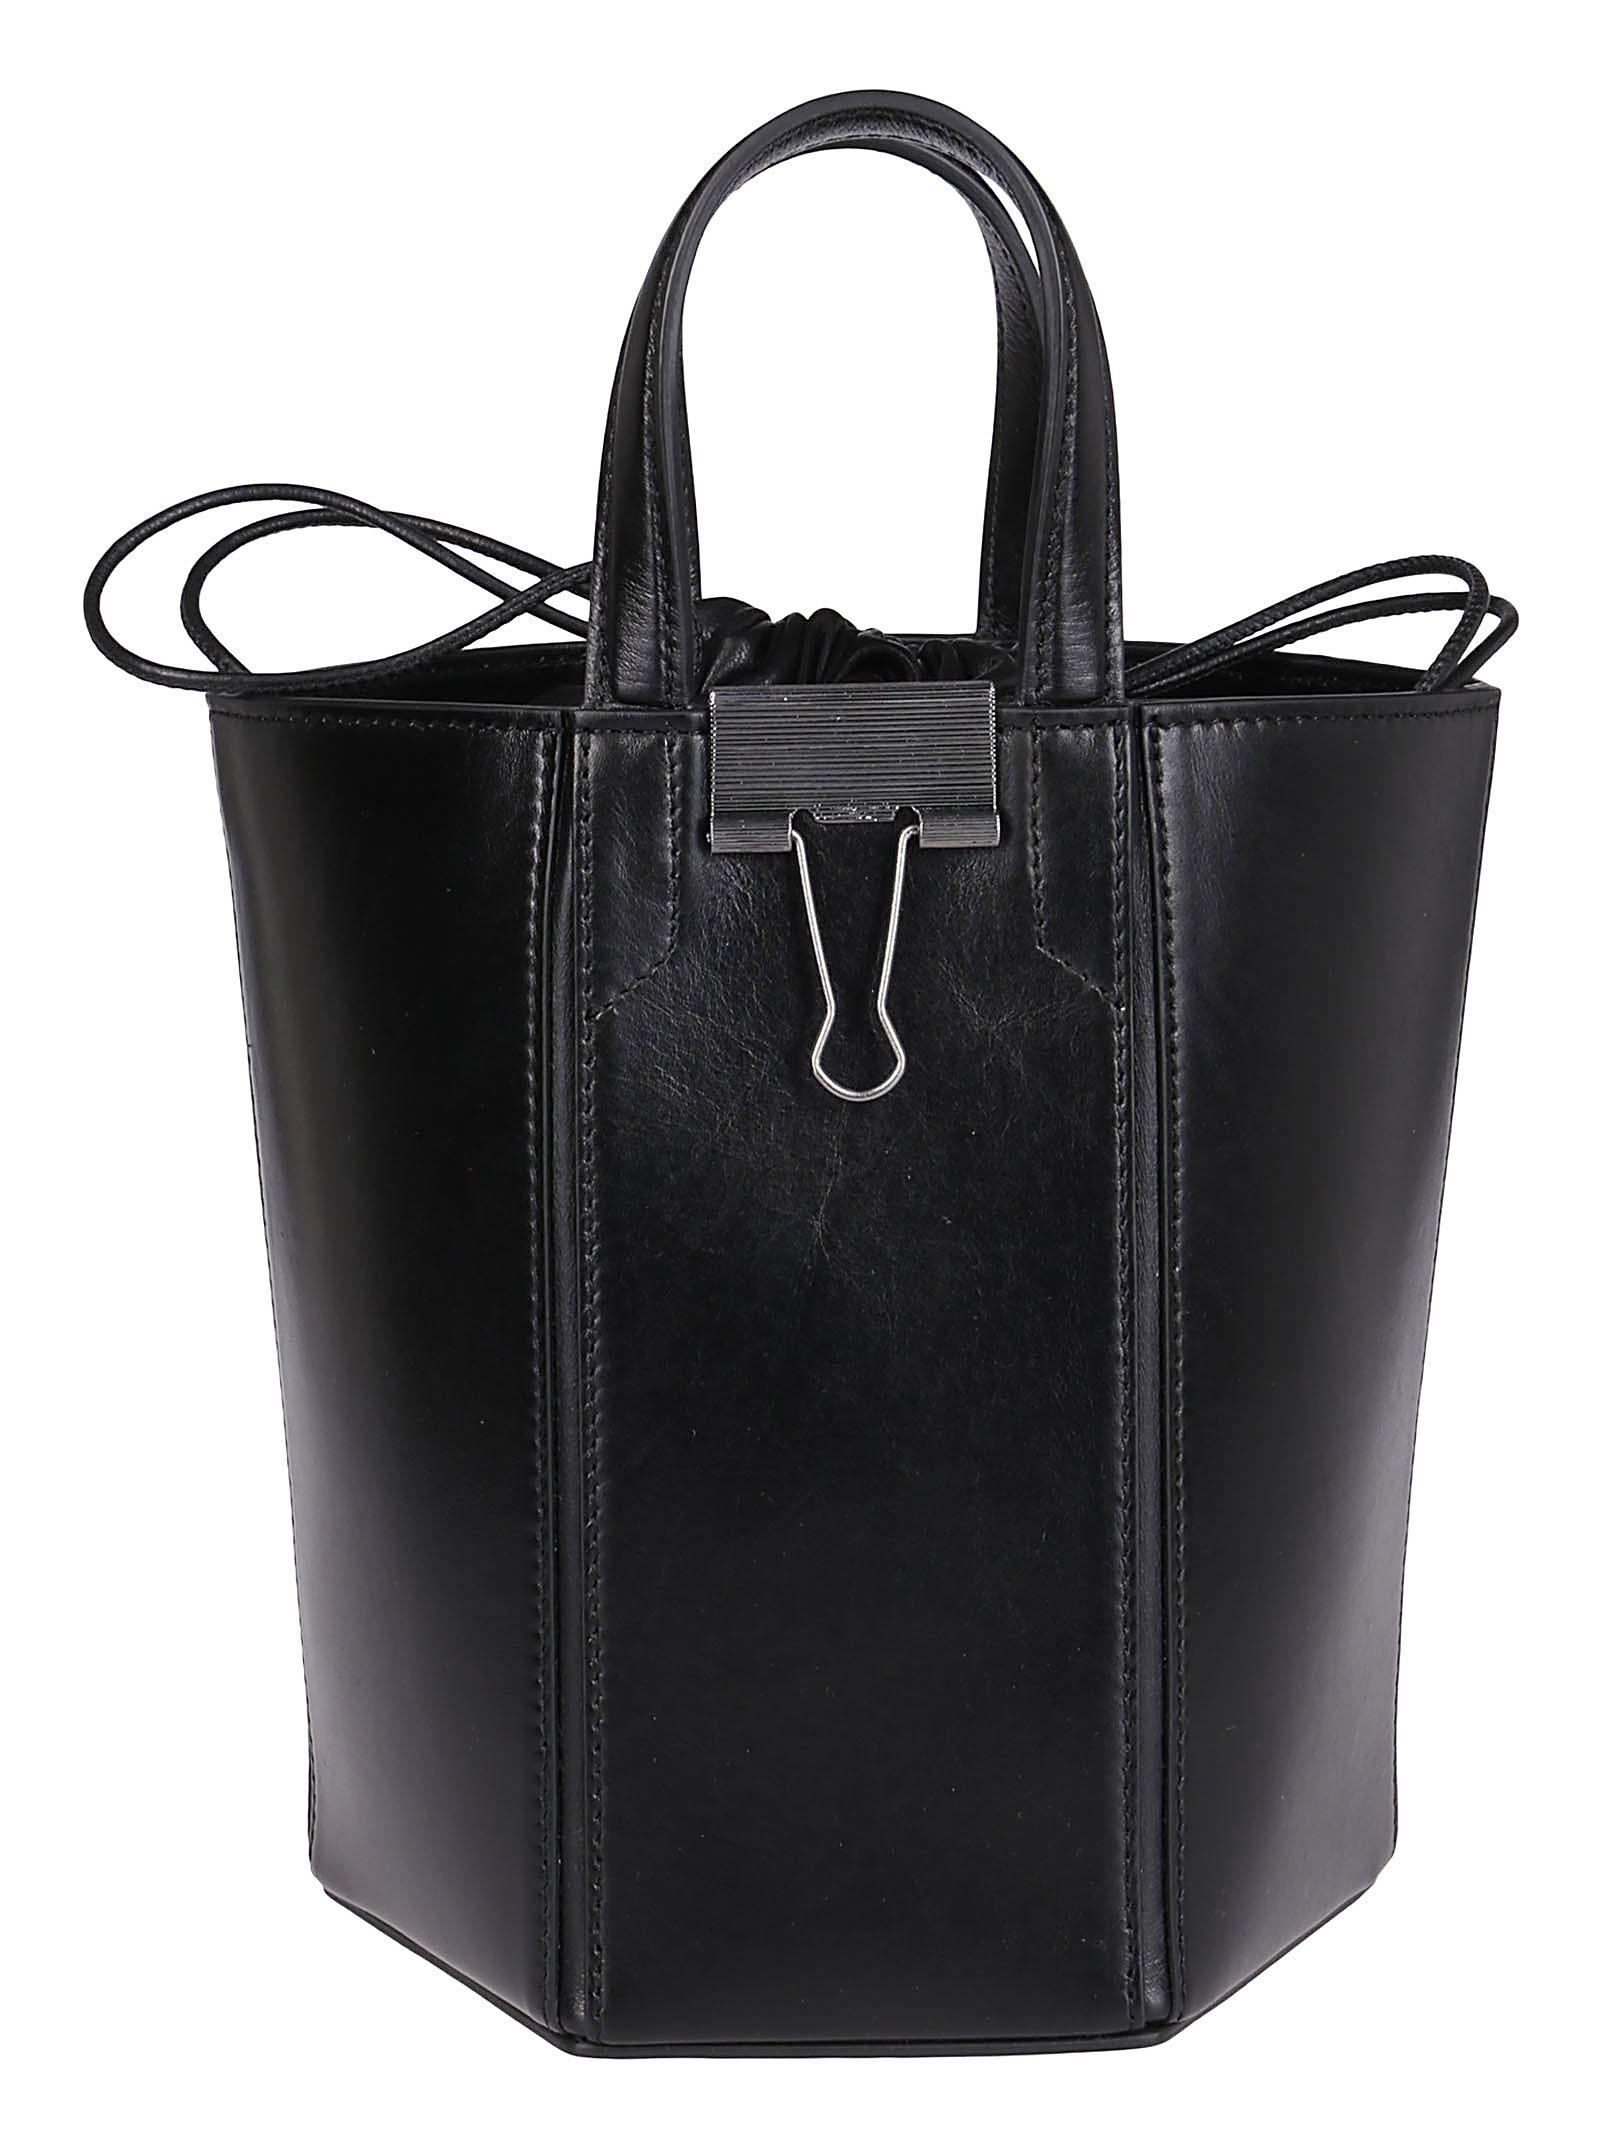 Off-White OFF-WHITE WOMEN'S BLACK SHOULDER BAG